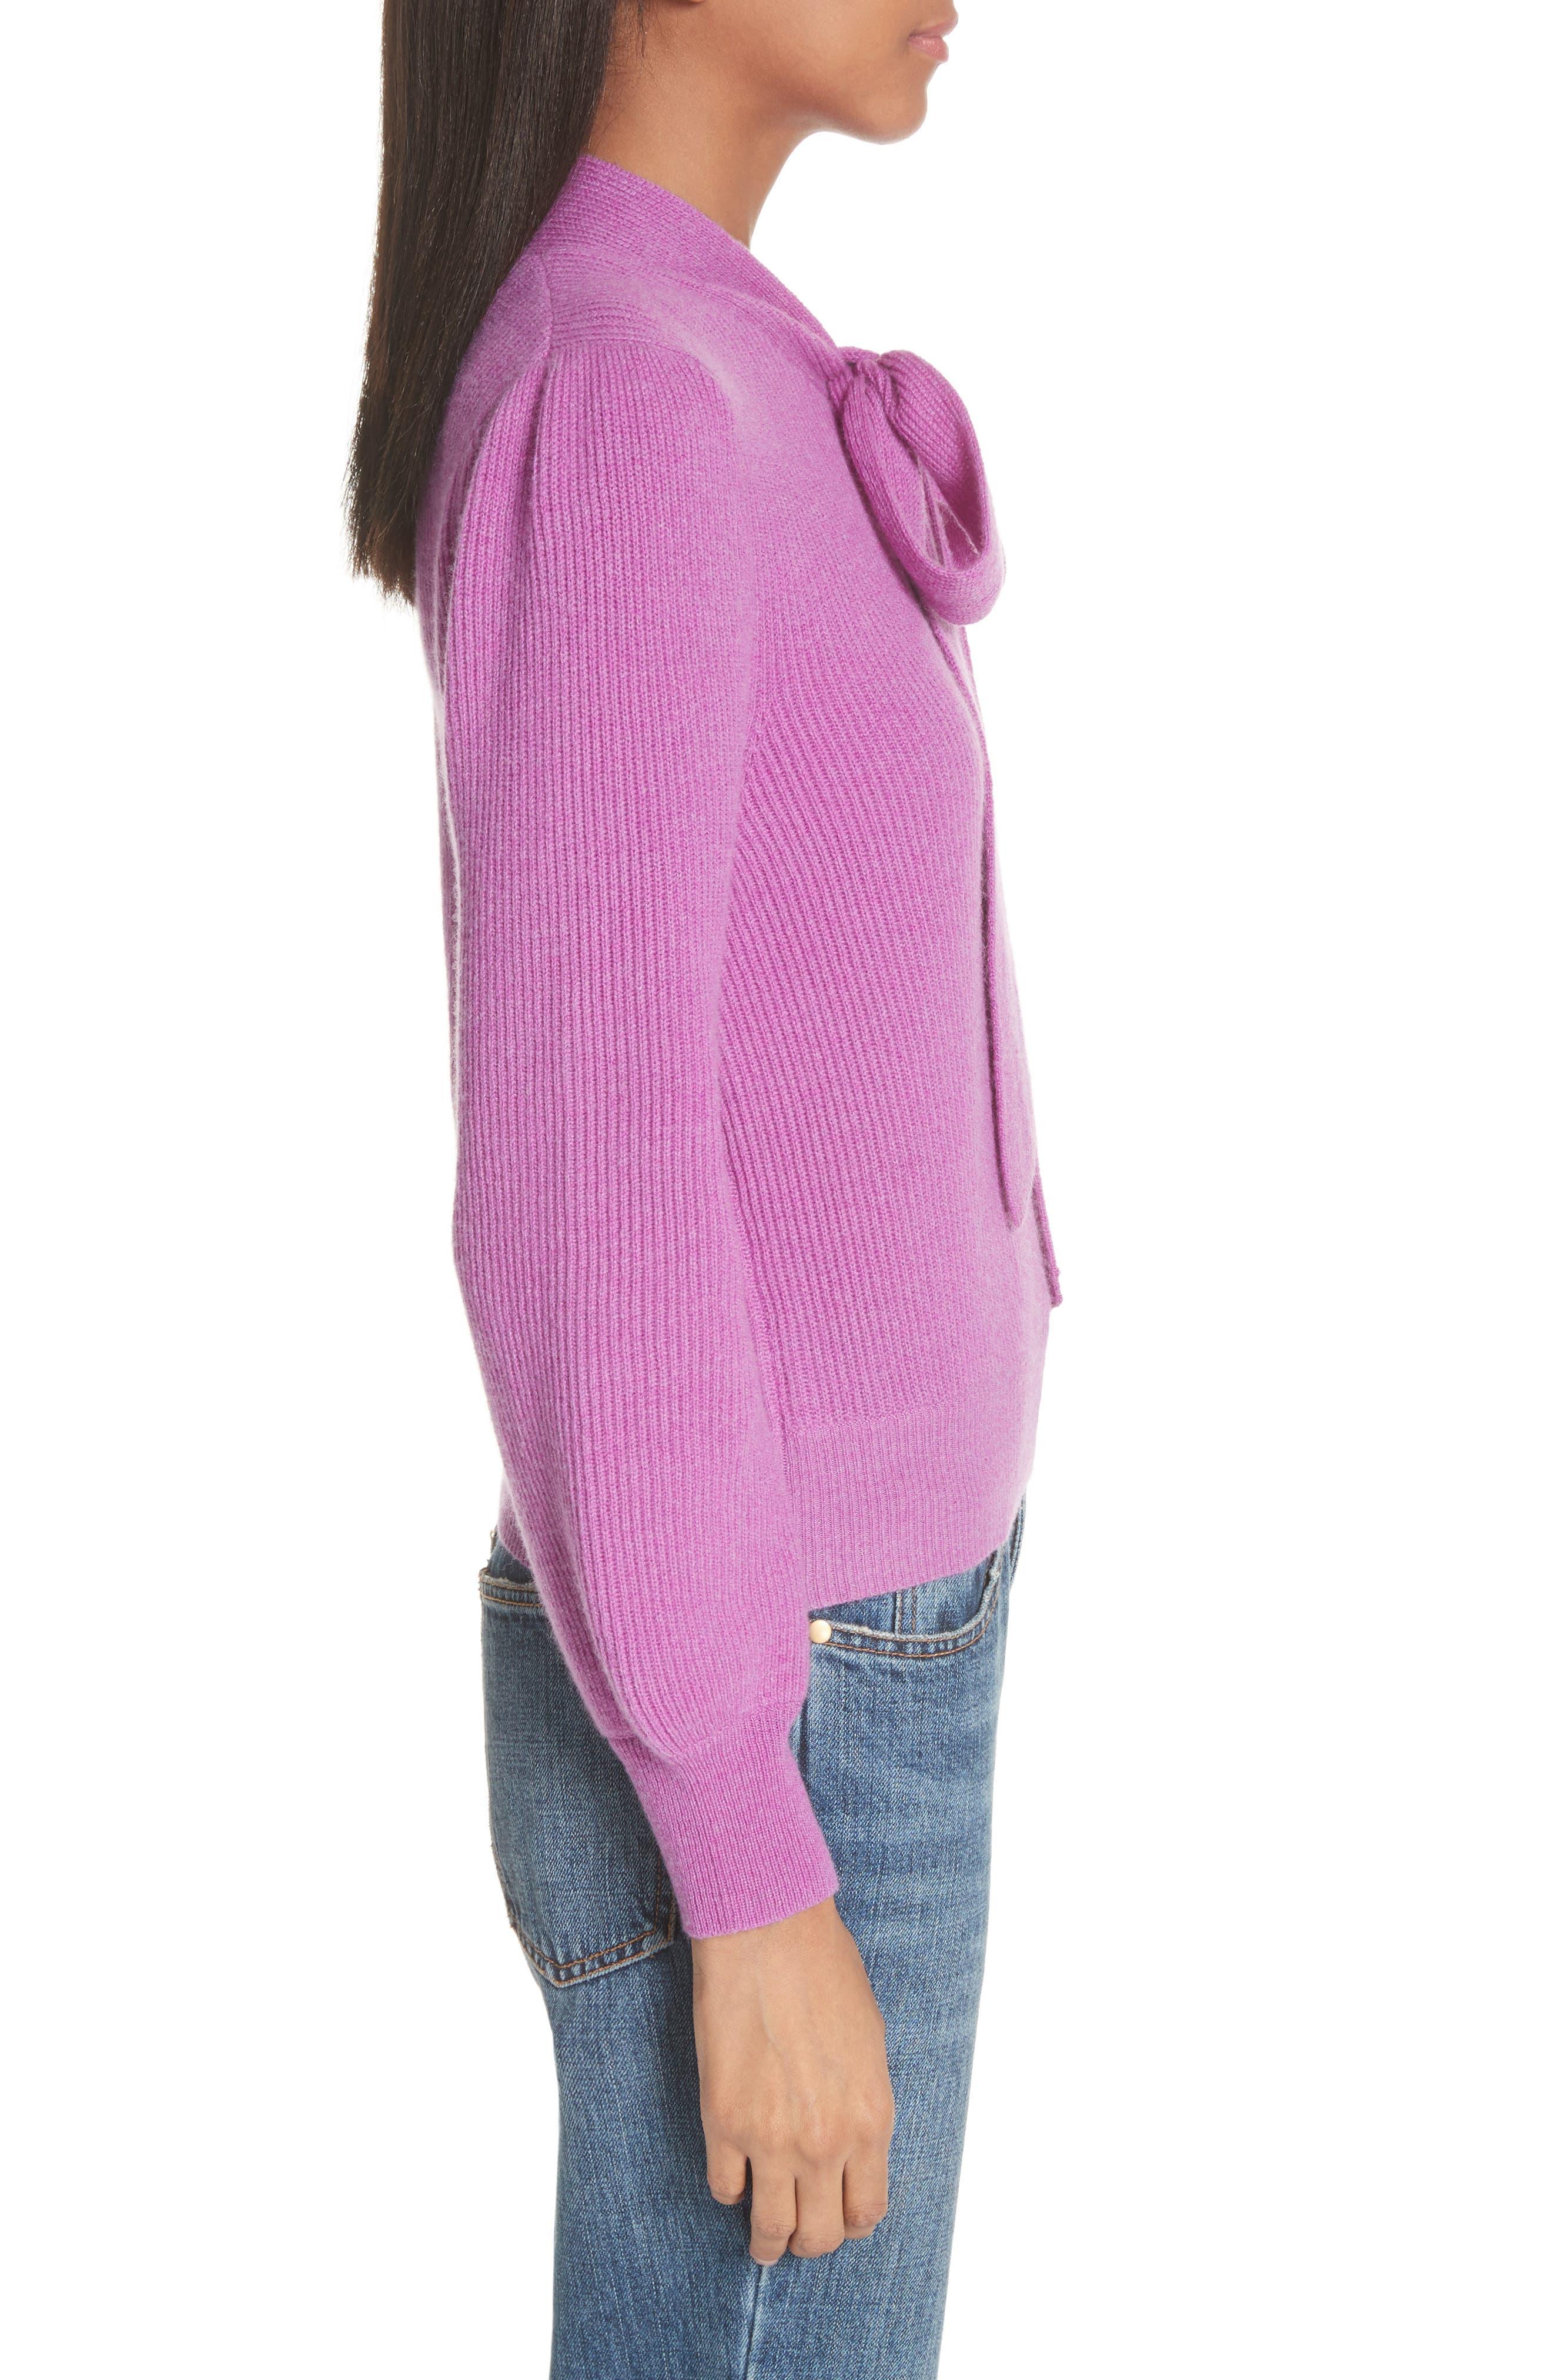 CO,                             Tie Neck Cashmere Sweater,                             Alternate thumbnail 3, color,                             679